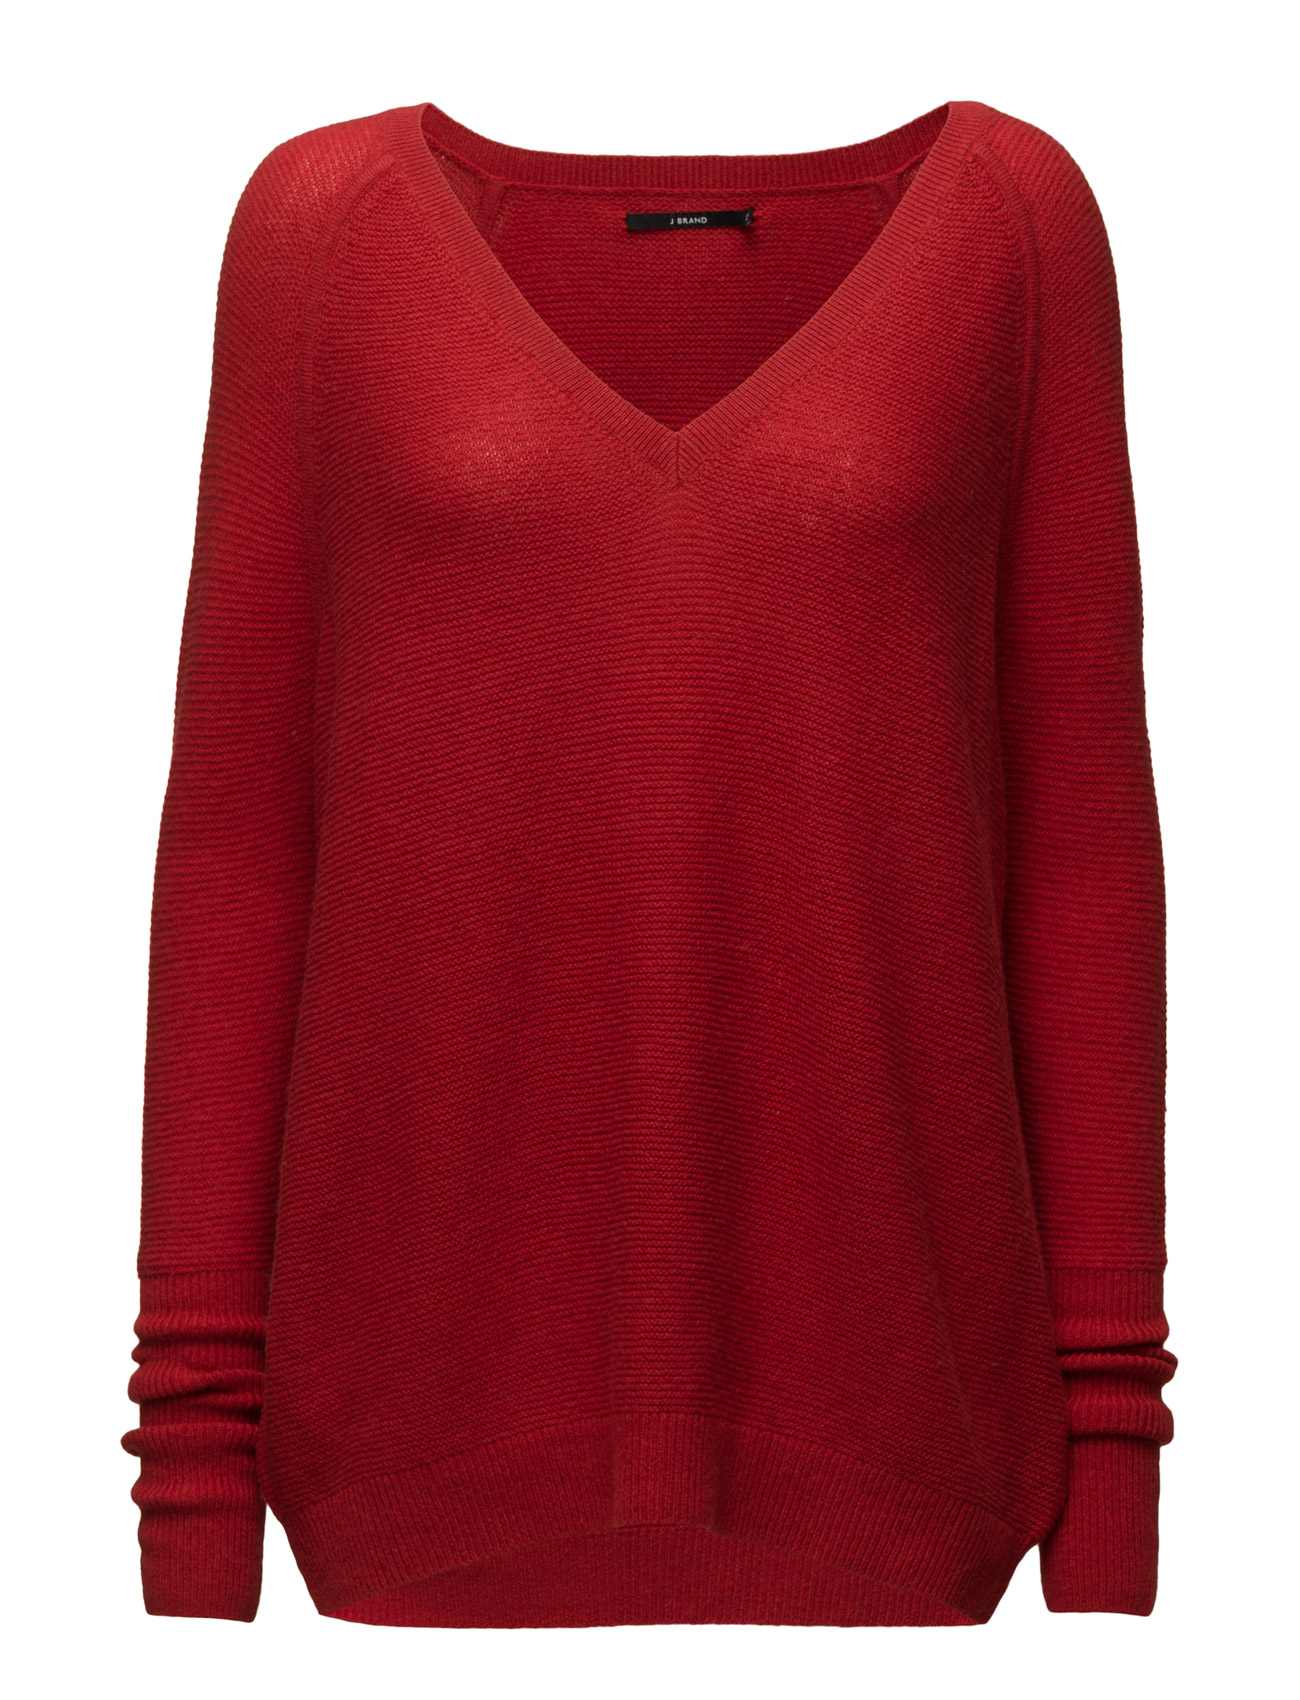 895071sw Bache Sweater J brand Sweatshirts til Damer i